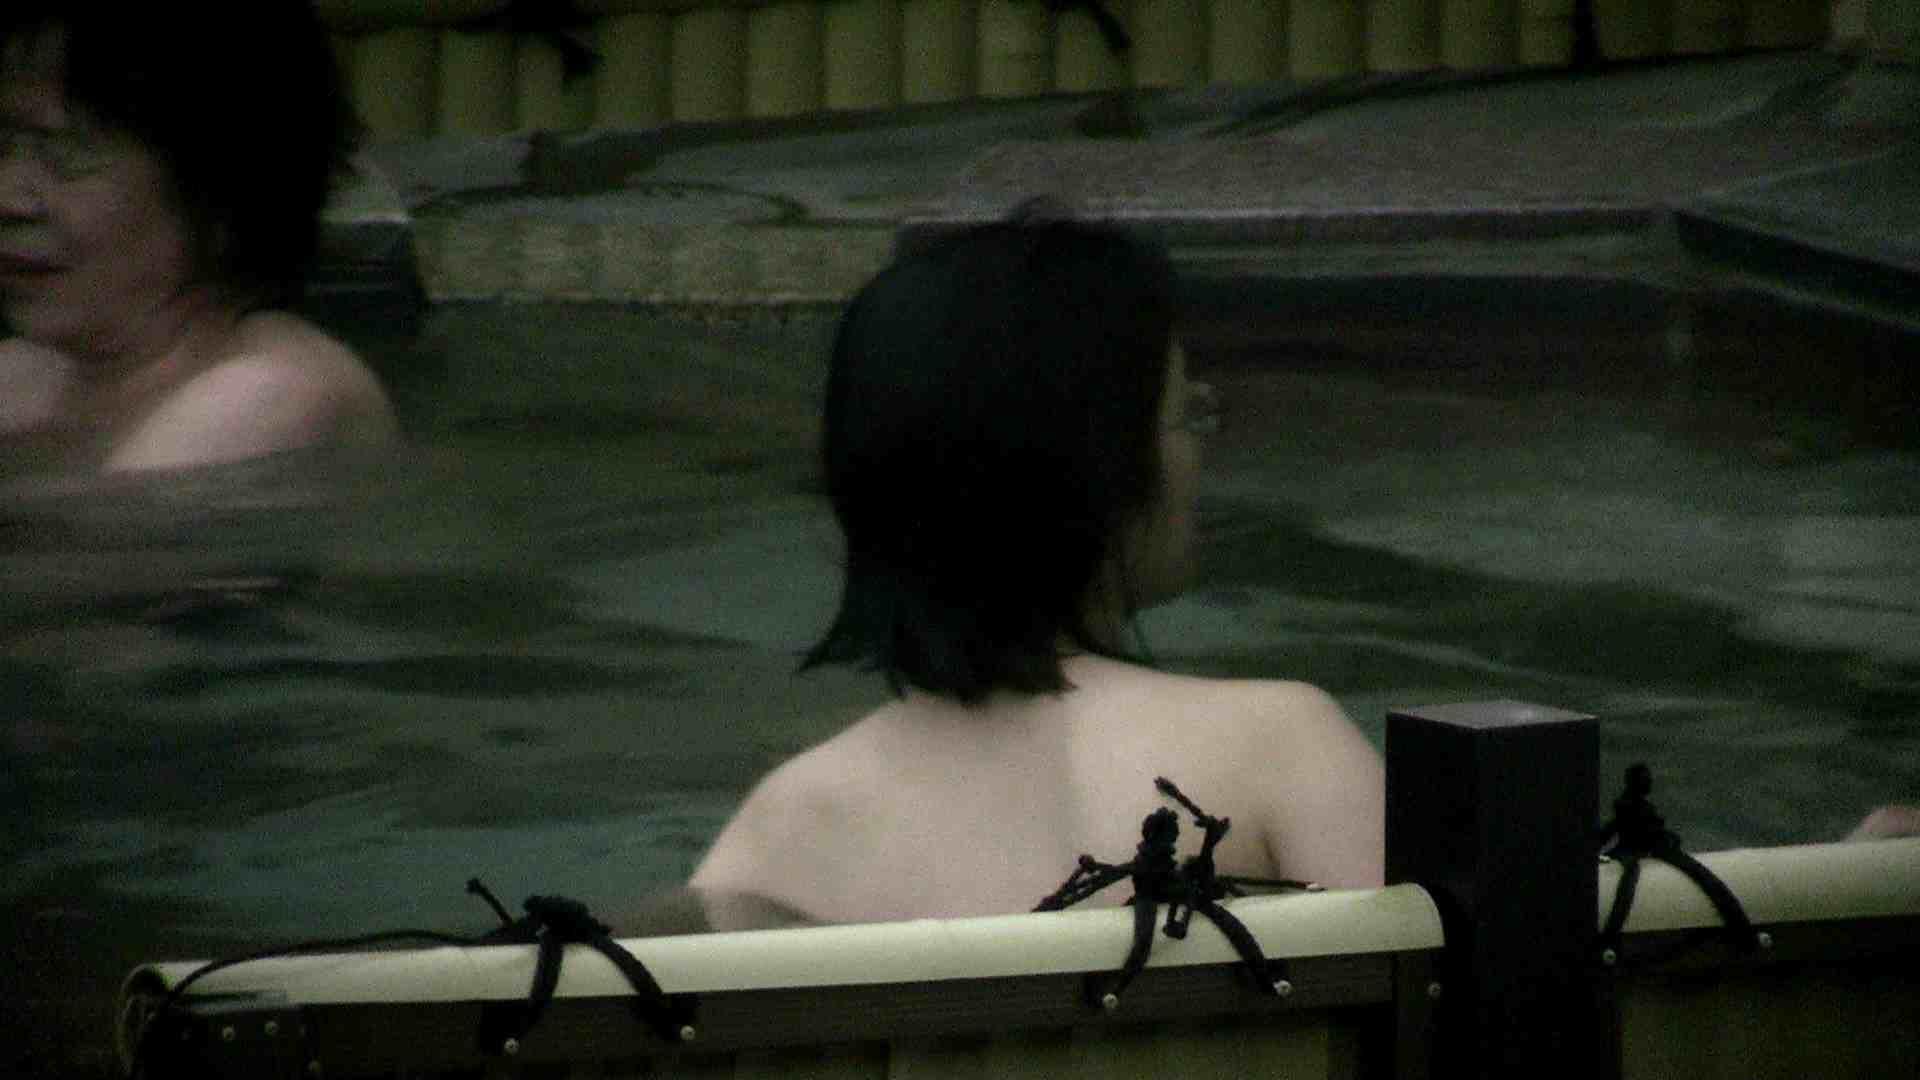 Aquaな露天風呂Vol.684 0   エッチな盗撮  87pic 61